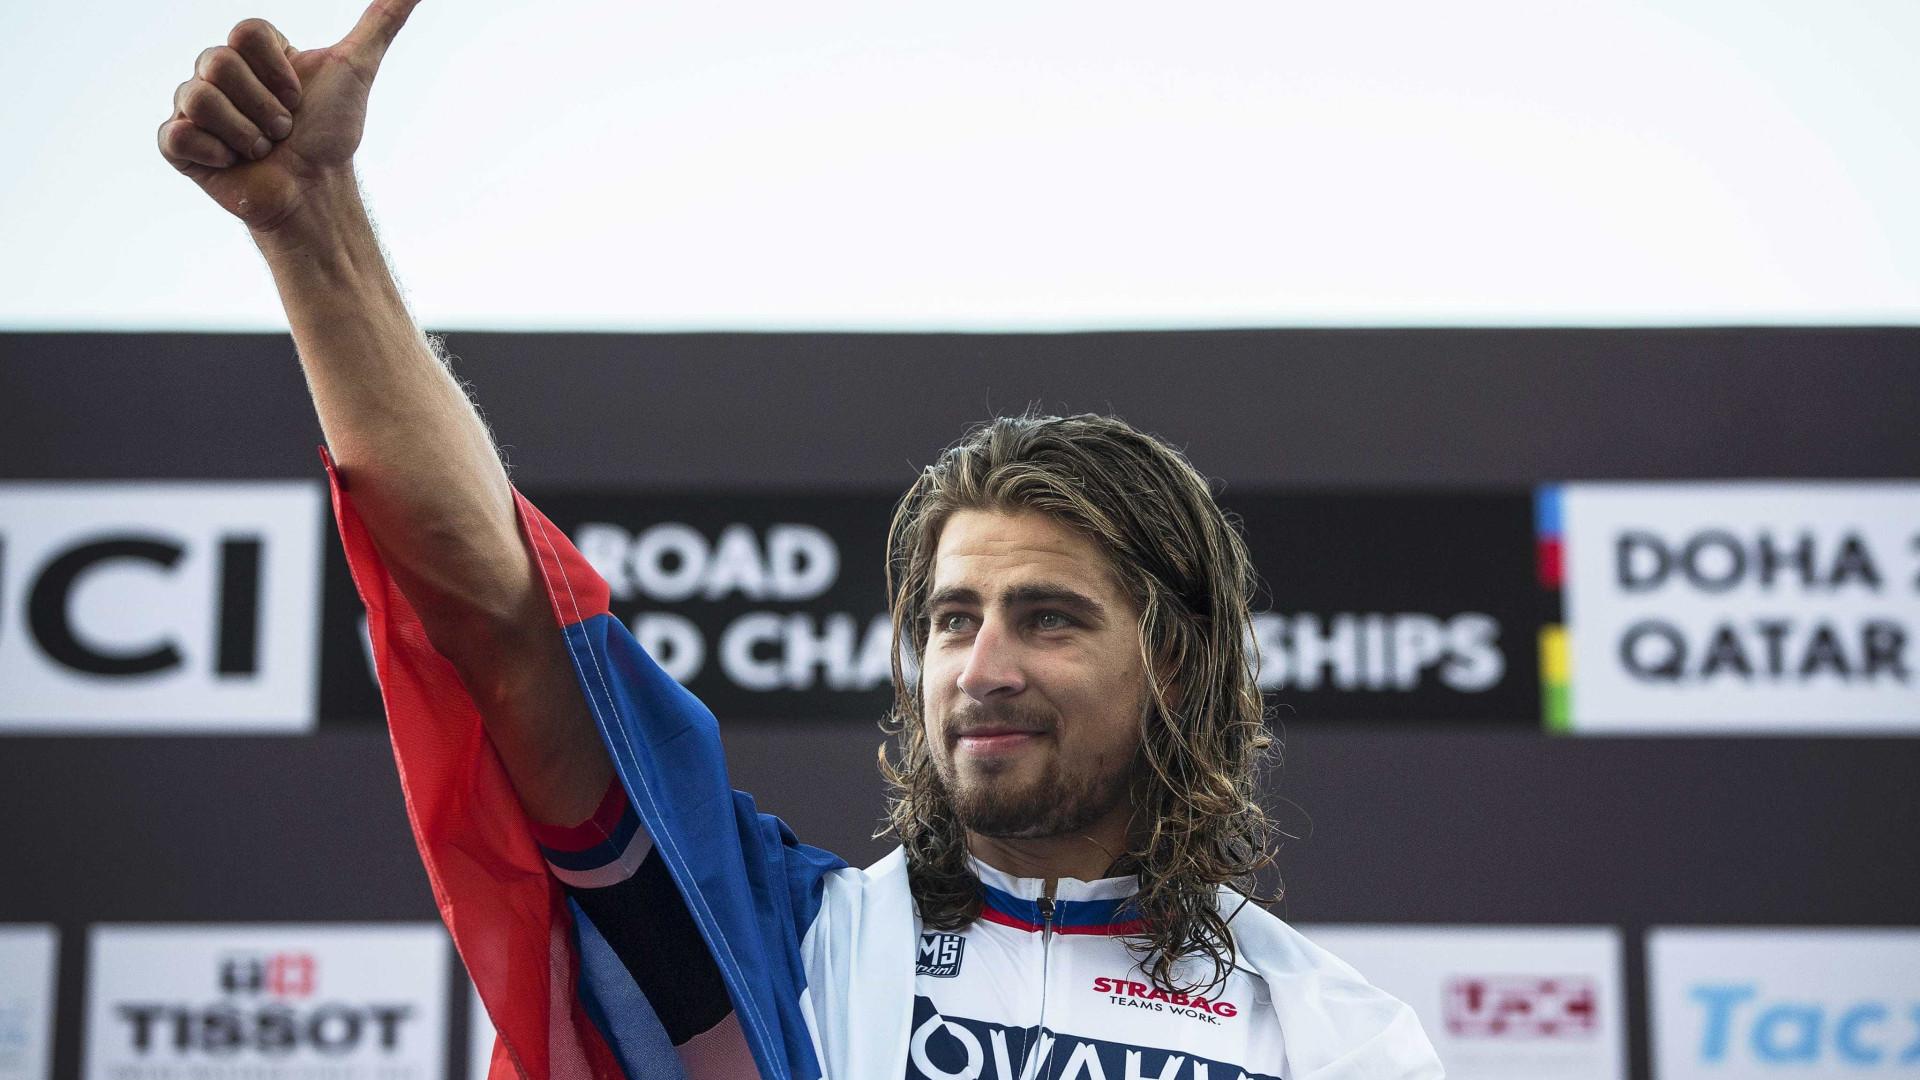 Peter Sagan premiado com 'Vélo d'Or'